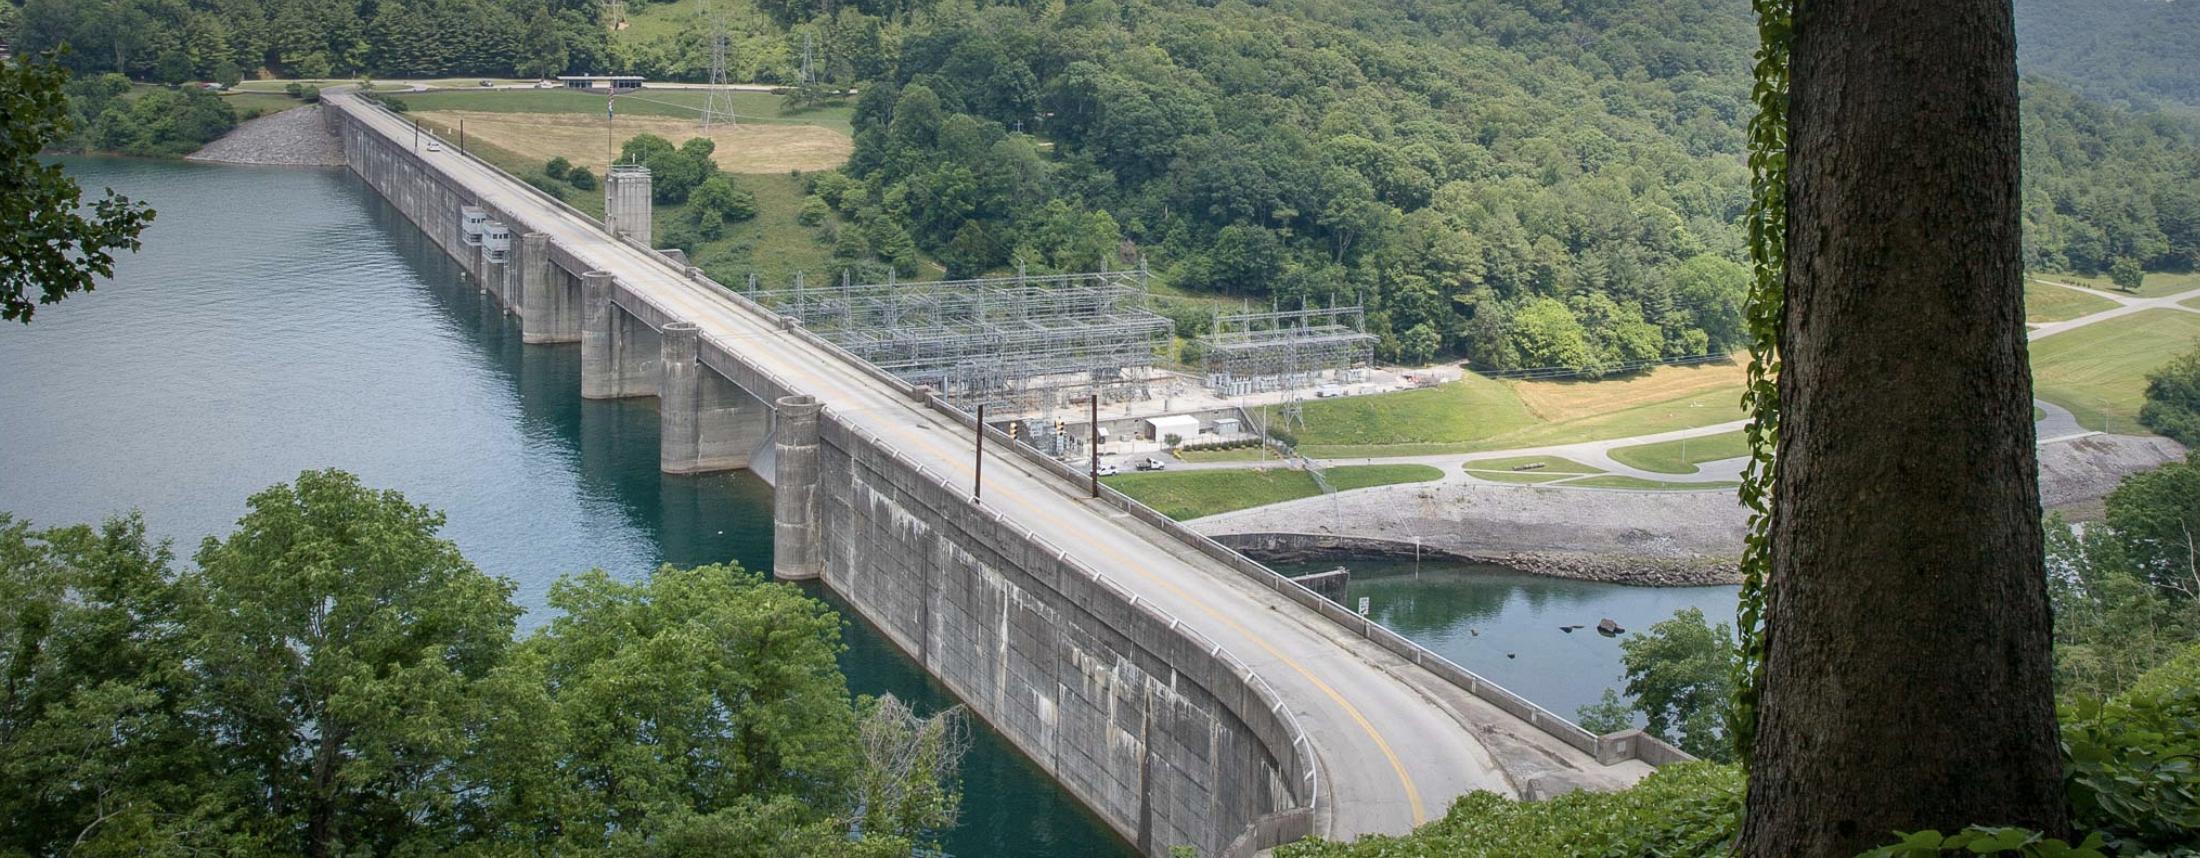 TVA Norris Dam in Anderson County (Photo: TVA website)